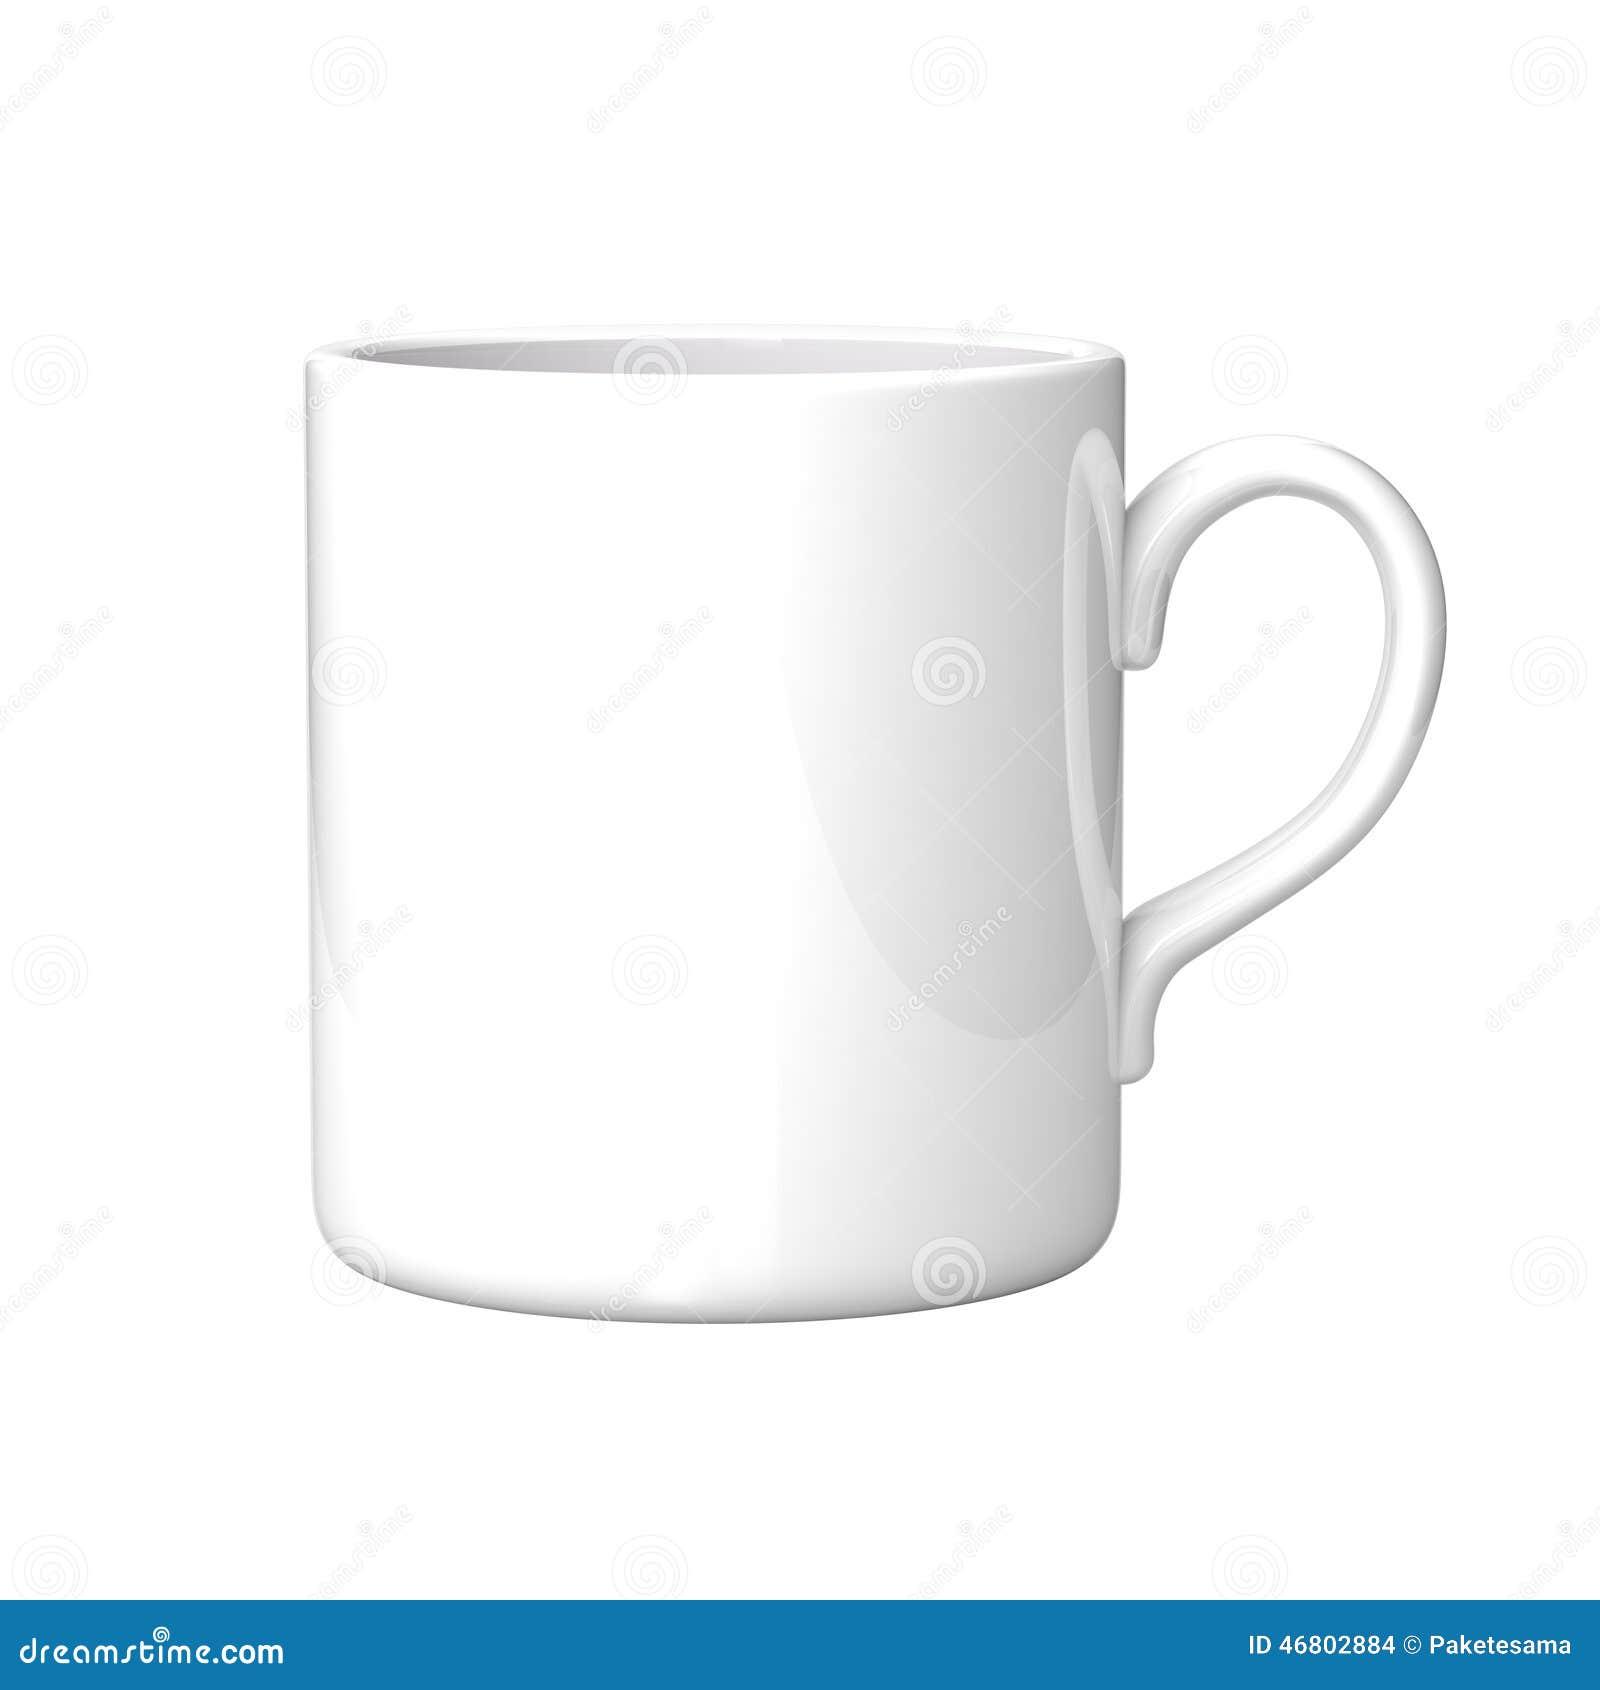 White coffee mug stock illustration. Illustration of brown - 46802884